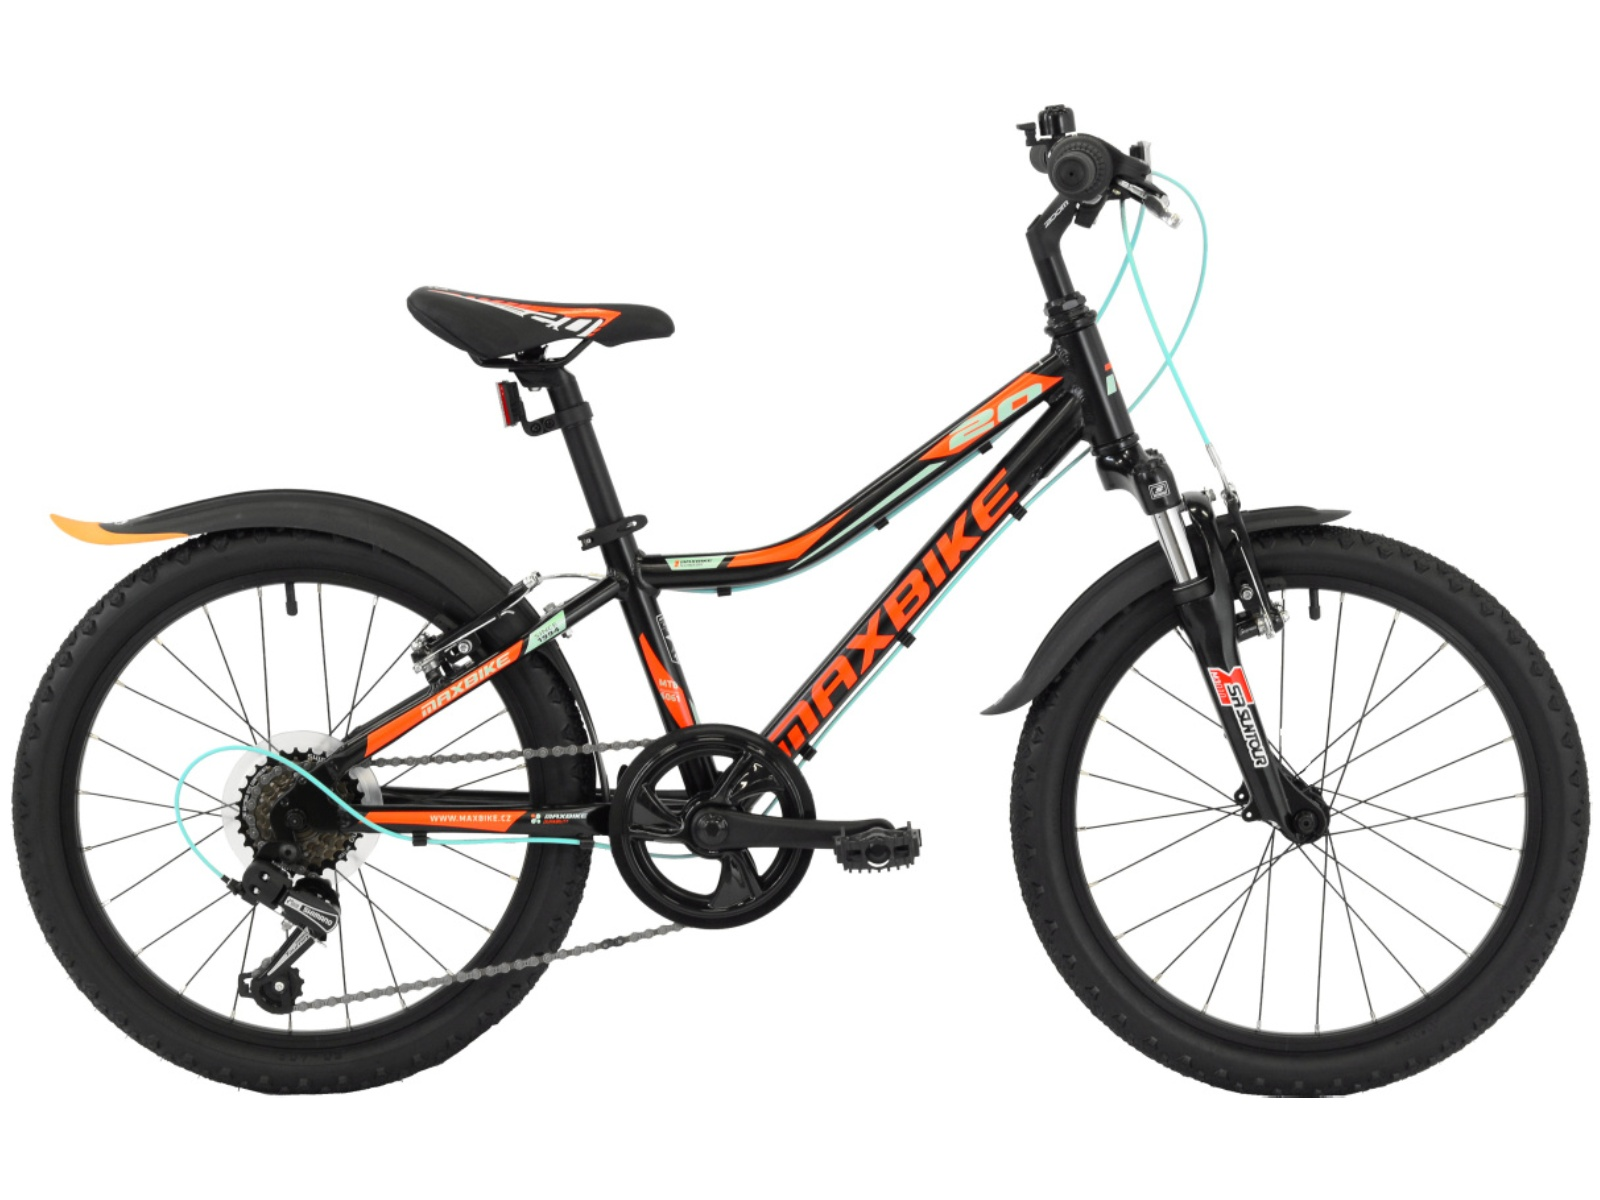 "Detský bicykel MAXBIKE Junior 20 ""SF - matne čierny"